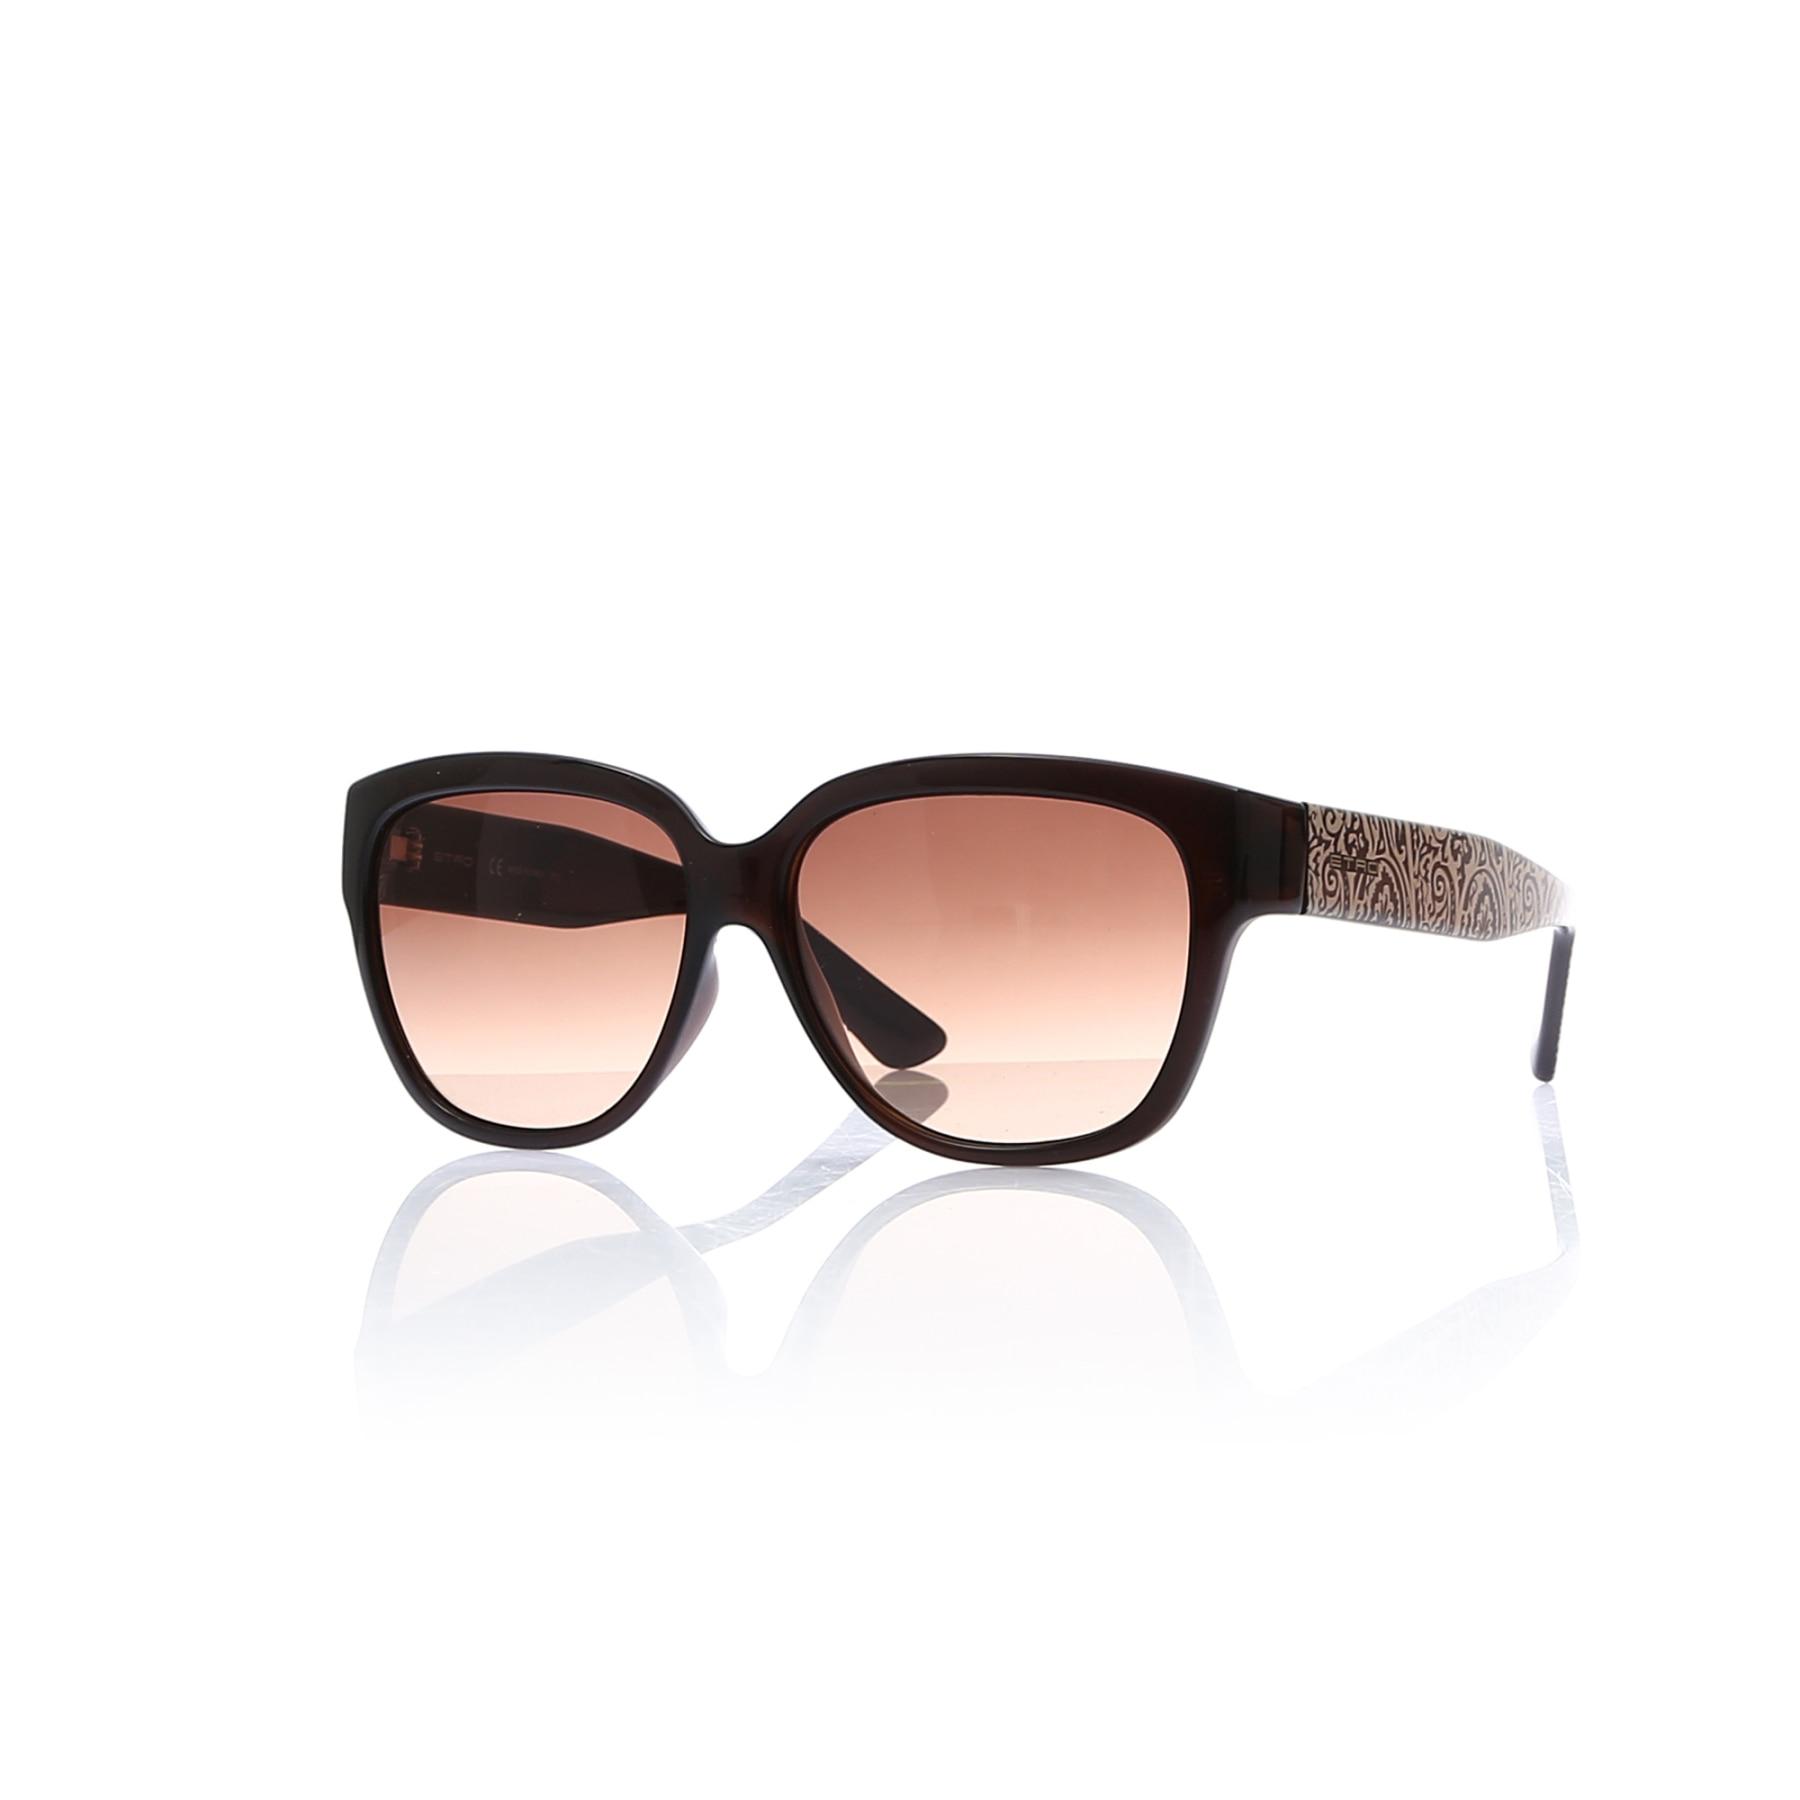 Women's sunglasses etr 606 210 bone Brown organic square square 57-14-135 etro